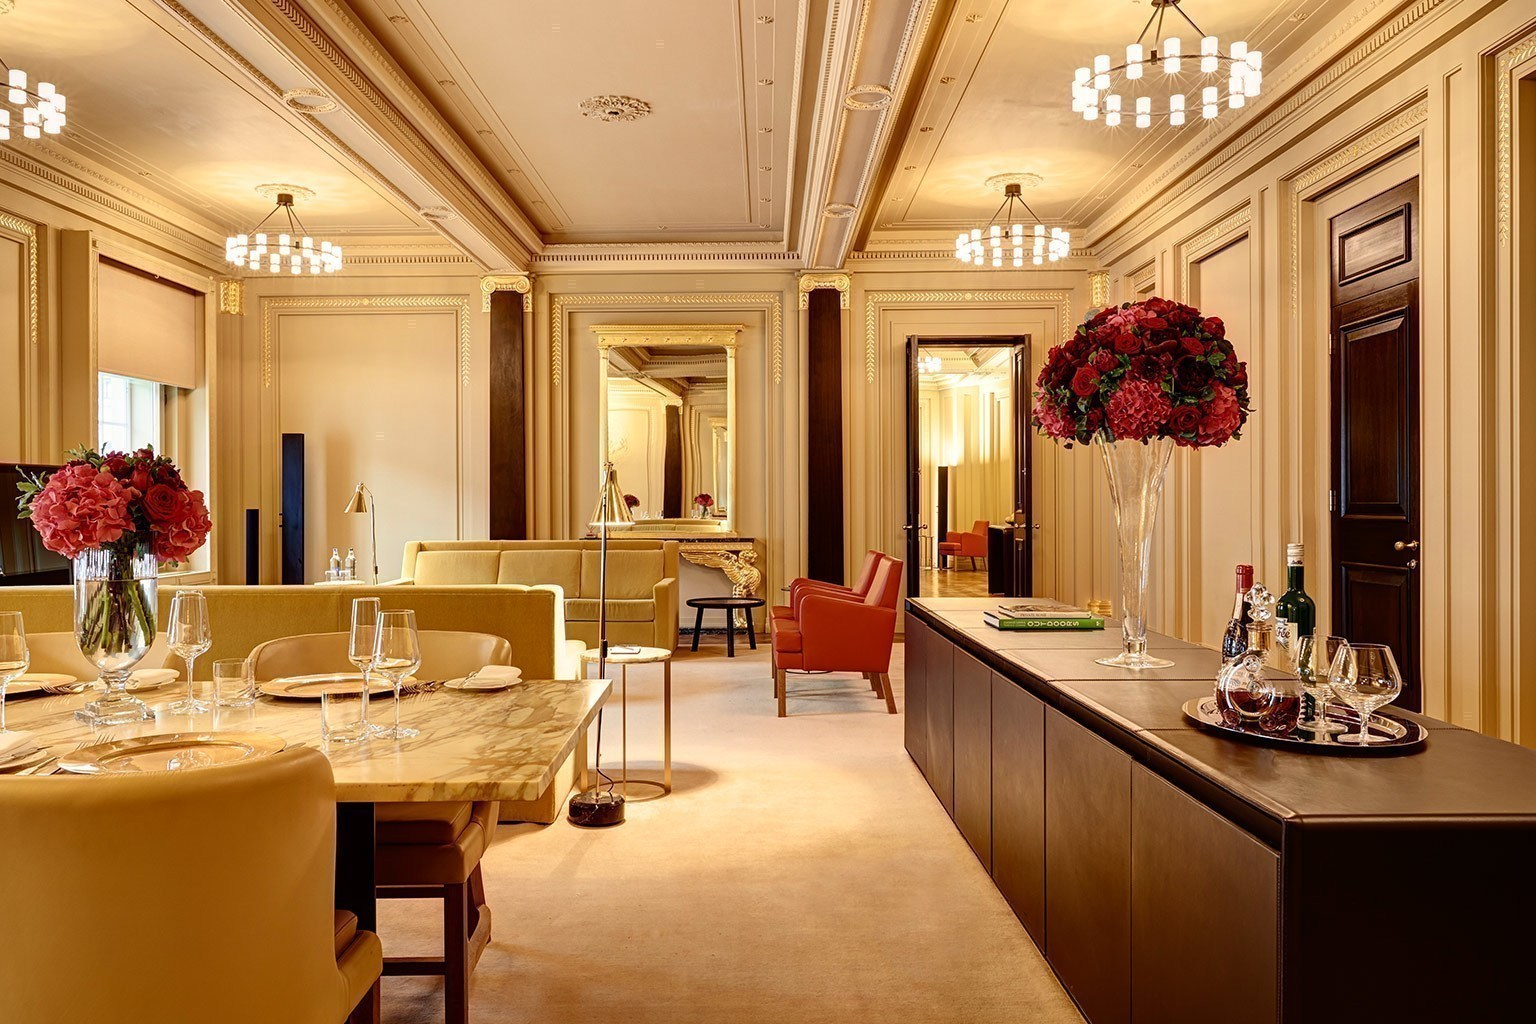 Hotel Caf U00e9 Royal Luxushotels Bei DESIGNREISEN